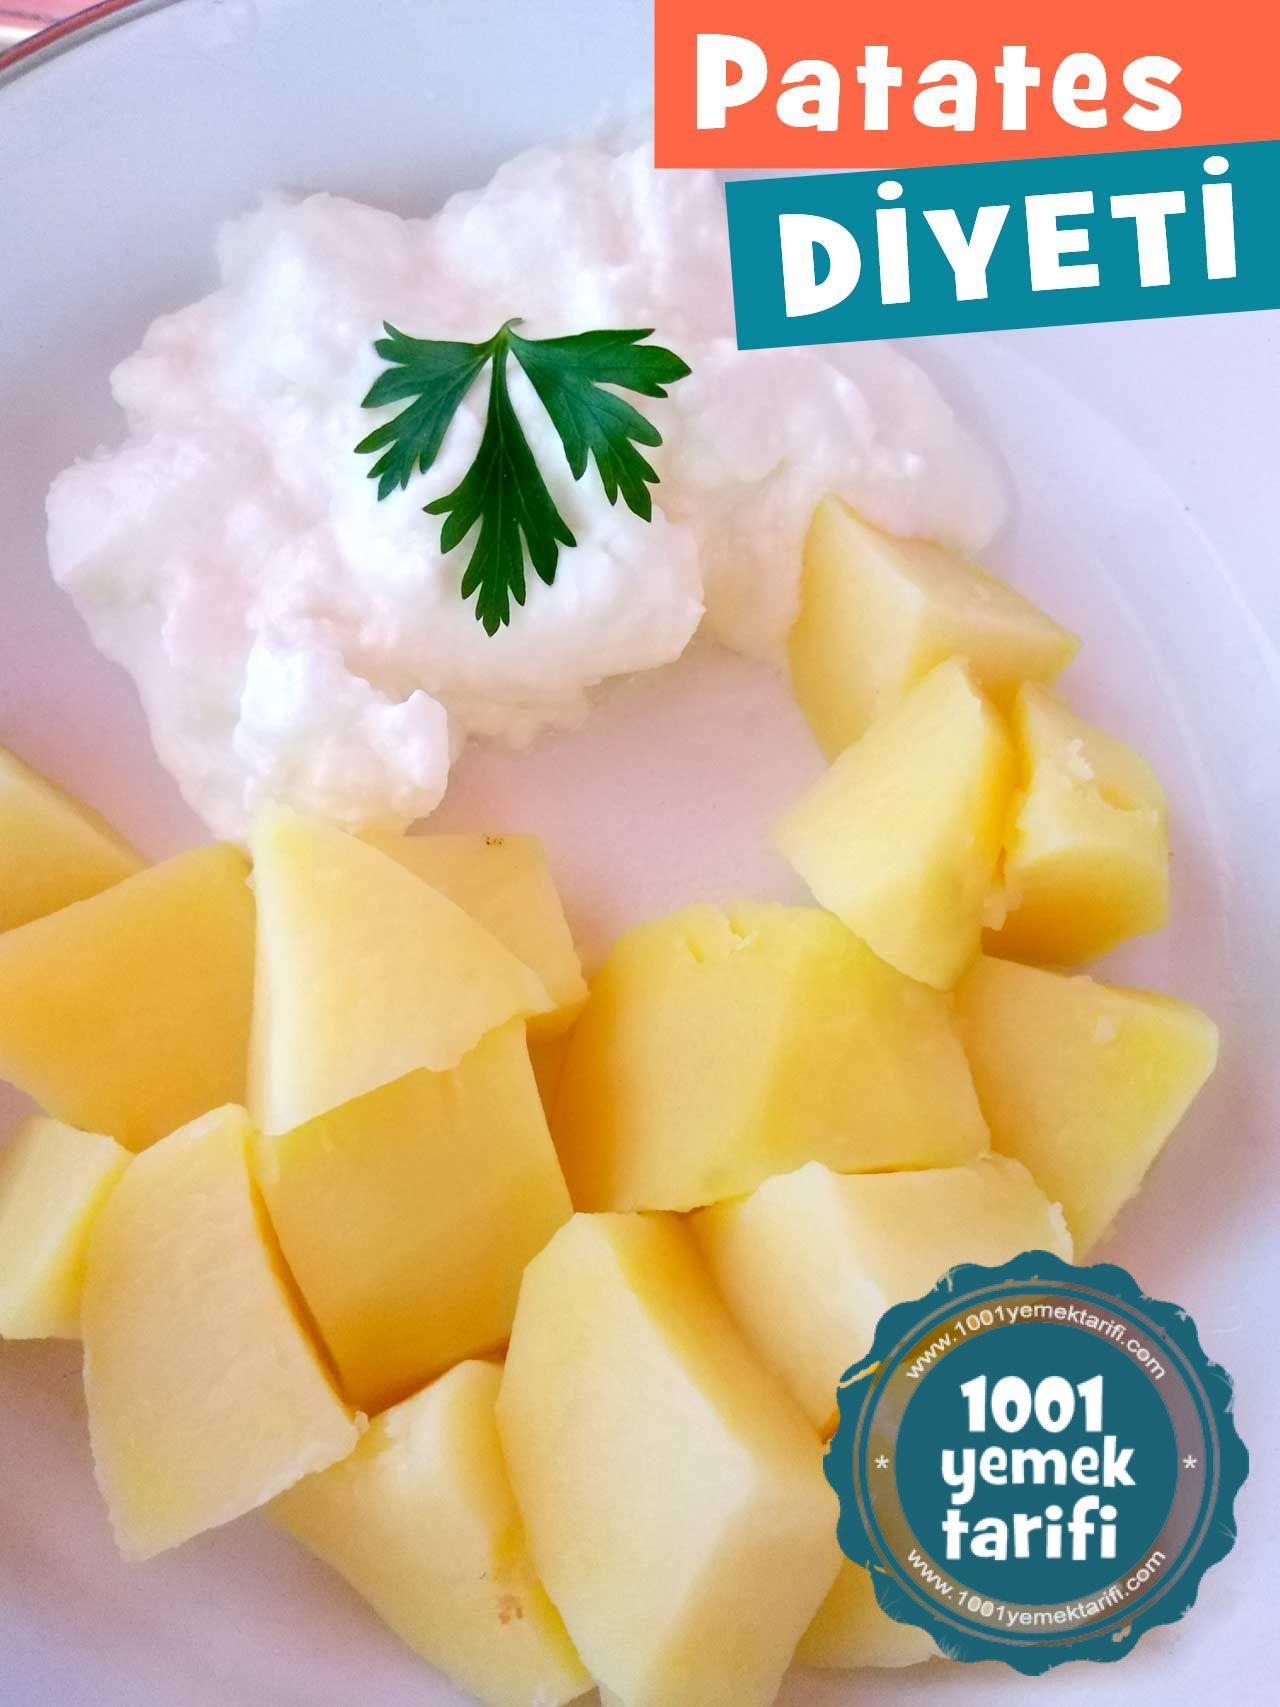 yogurtlu-haslanmis-patates-diyeti-nasil yapilir-yapimi-tarifi-nefis-1001yemektarifi-kac kalori